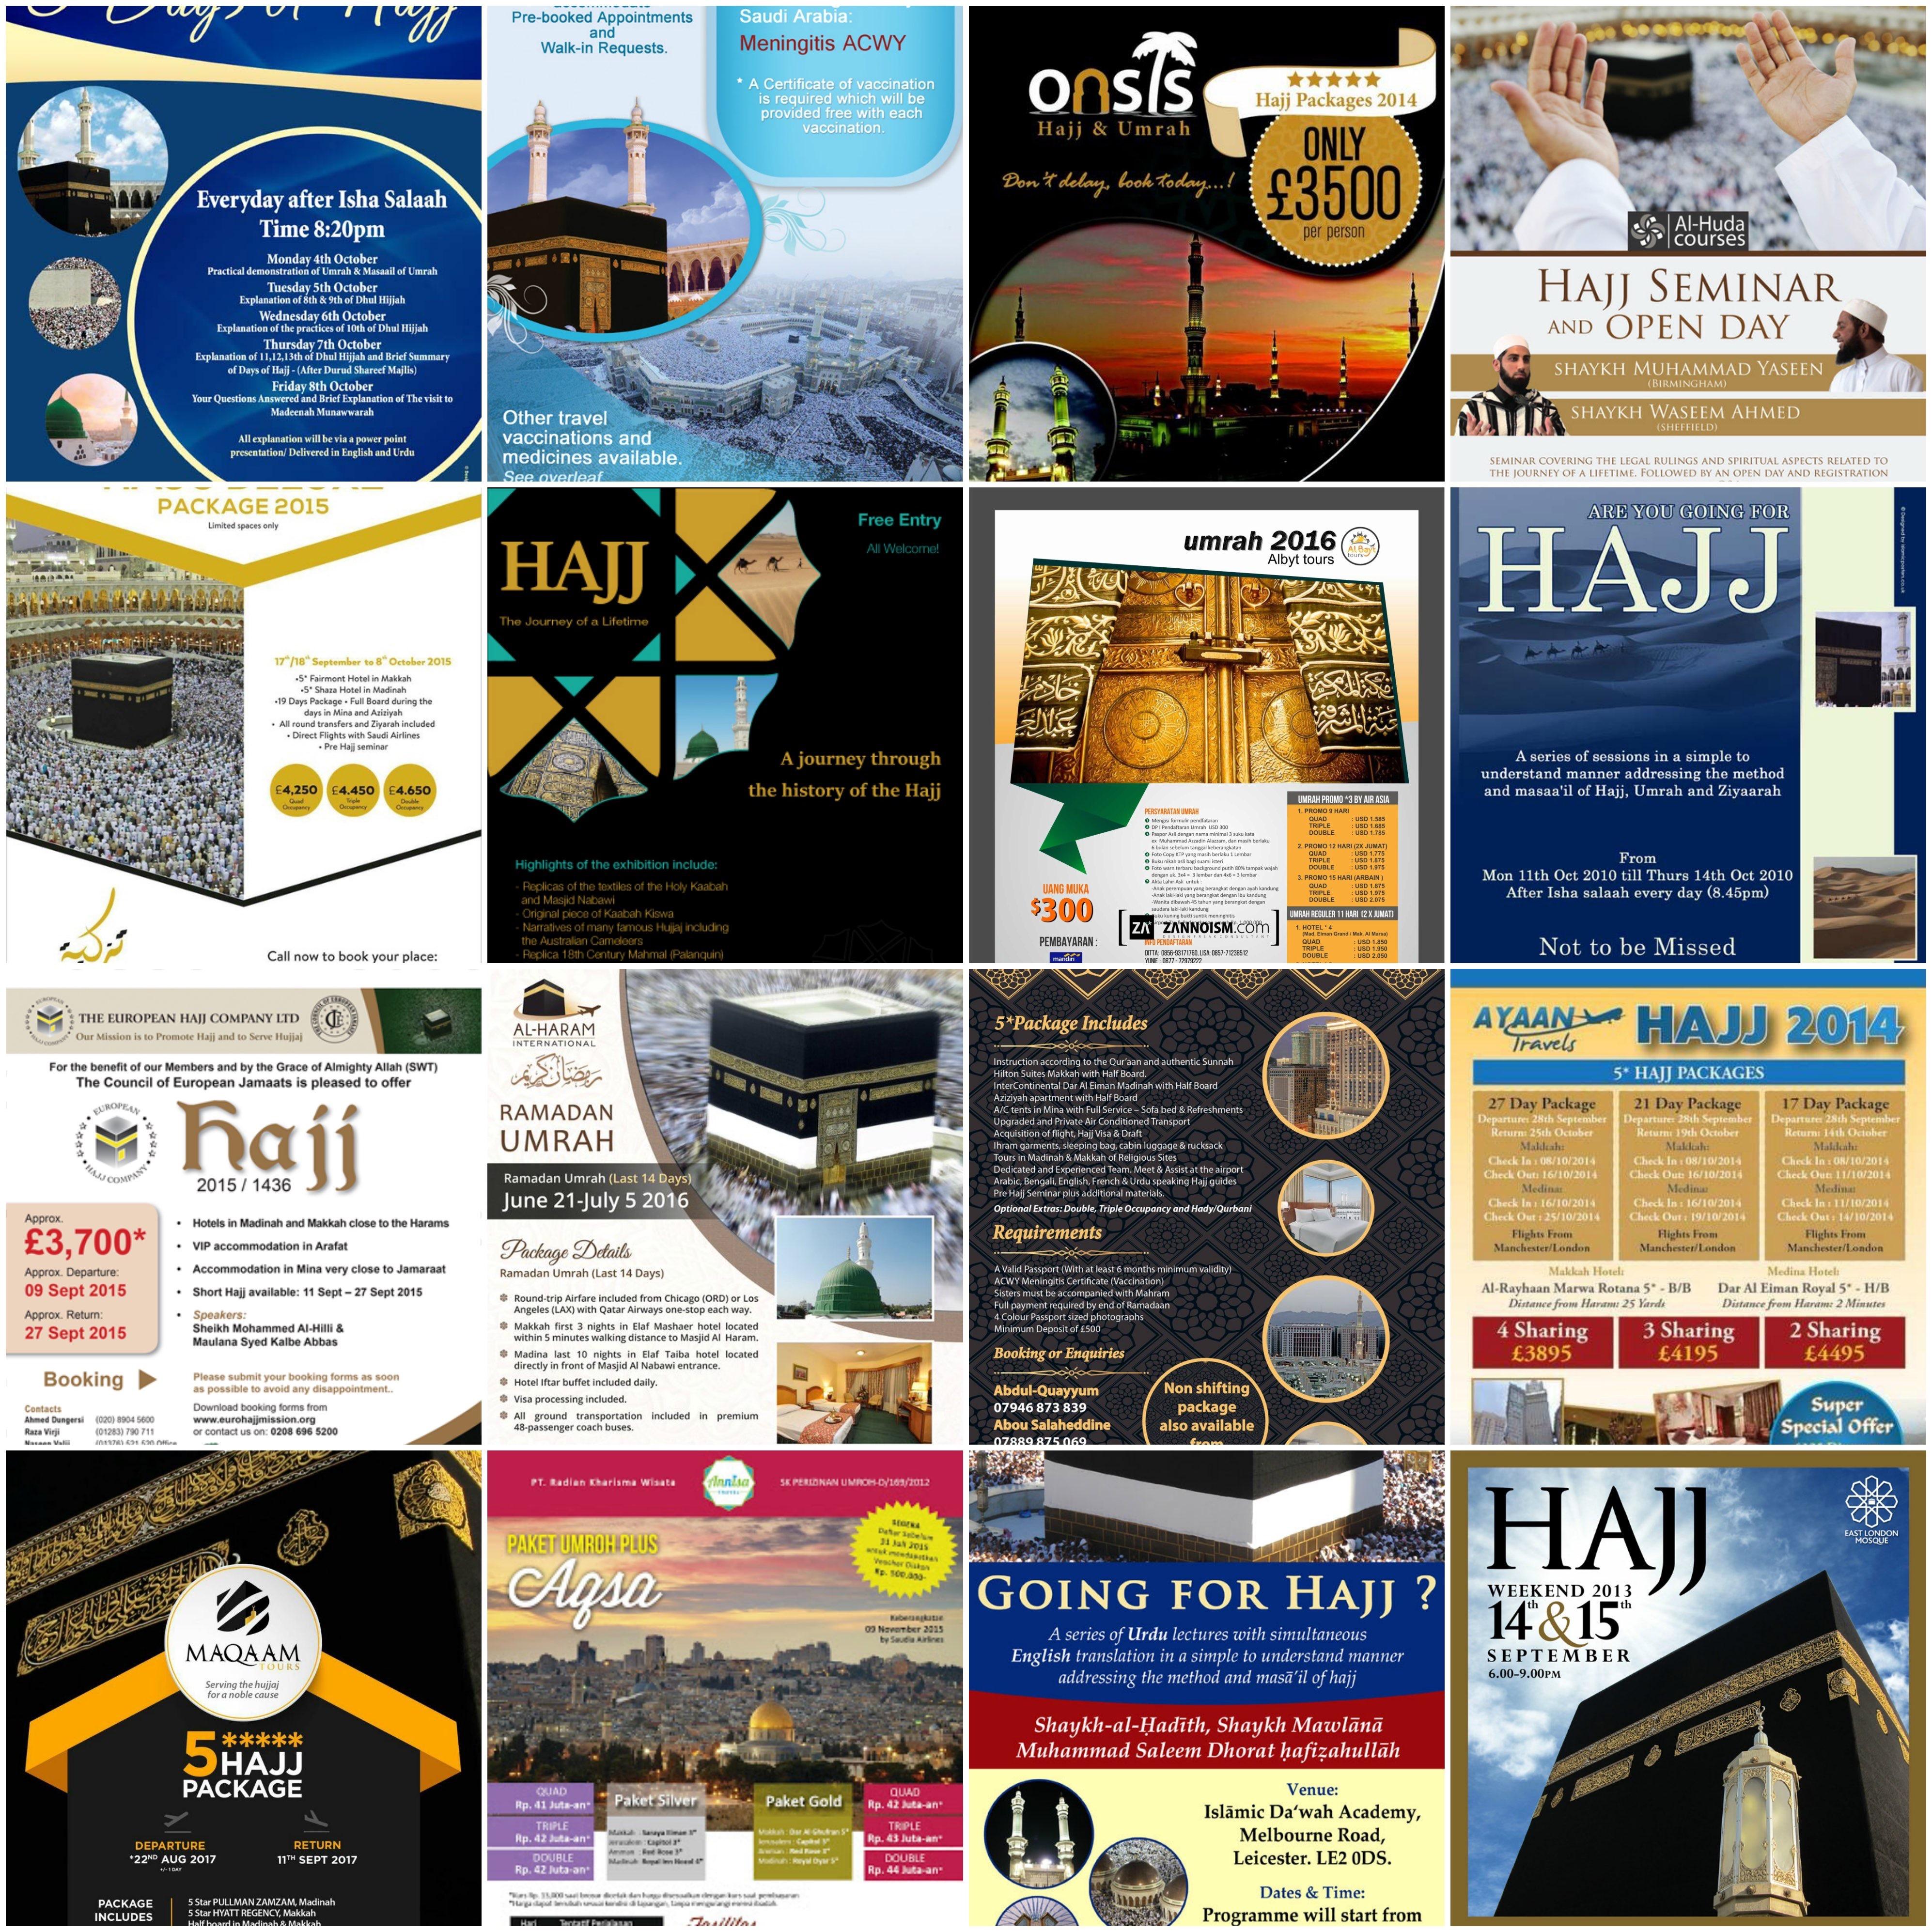 hajj-agent-leaflet-poster-copy.jpg